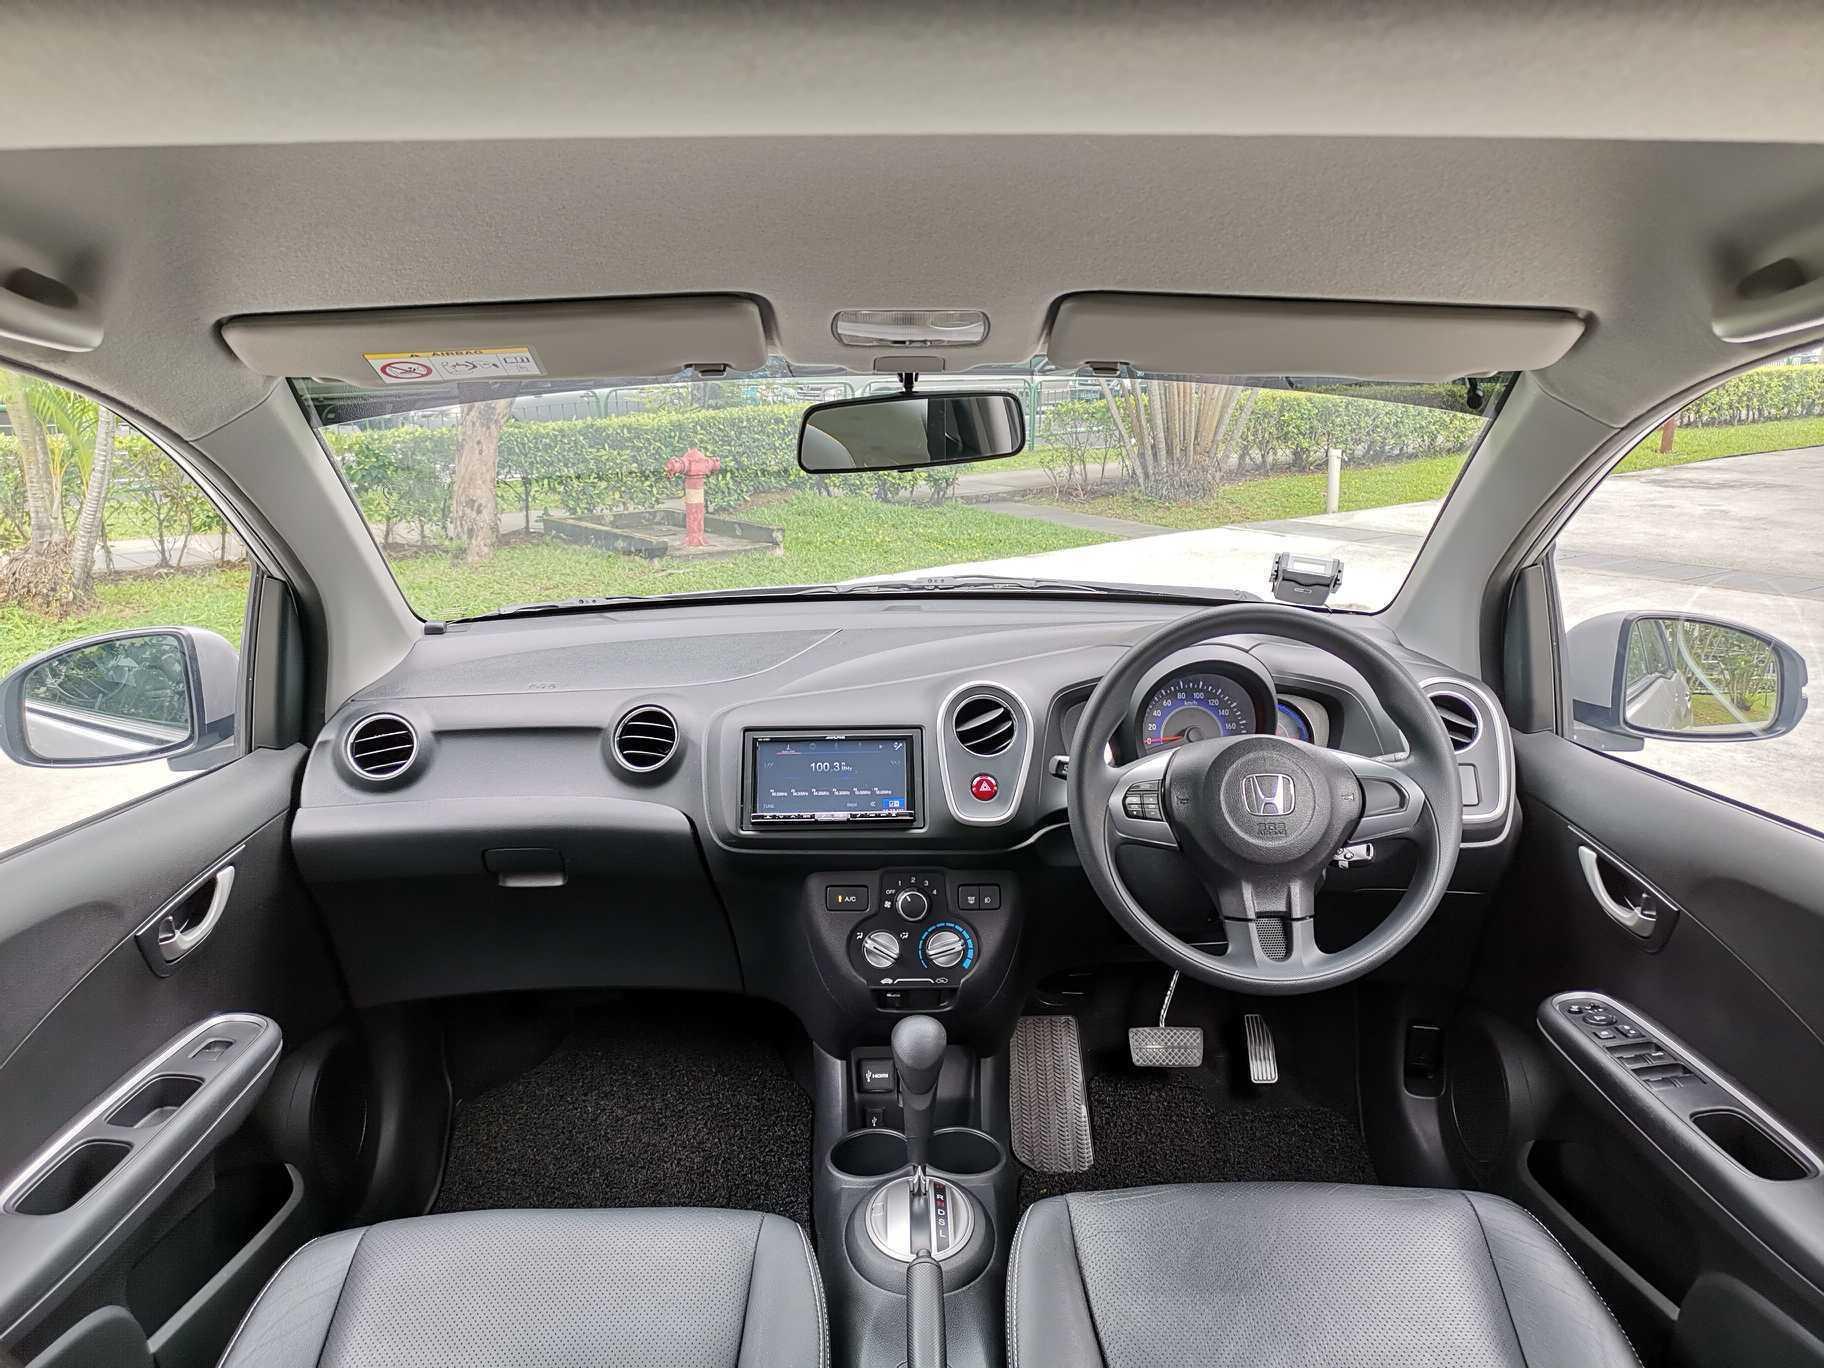 Honda Mobilio 1.5 RS Basic MPV i-VTEC Auto